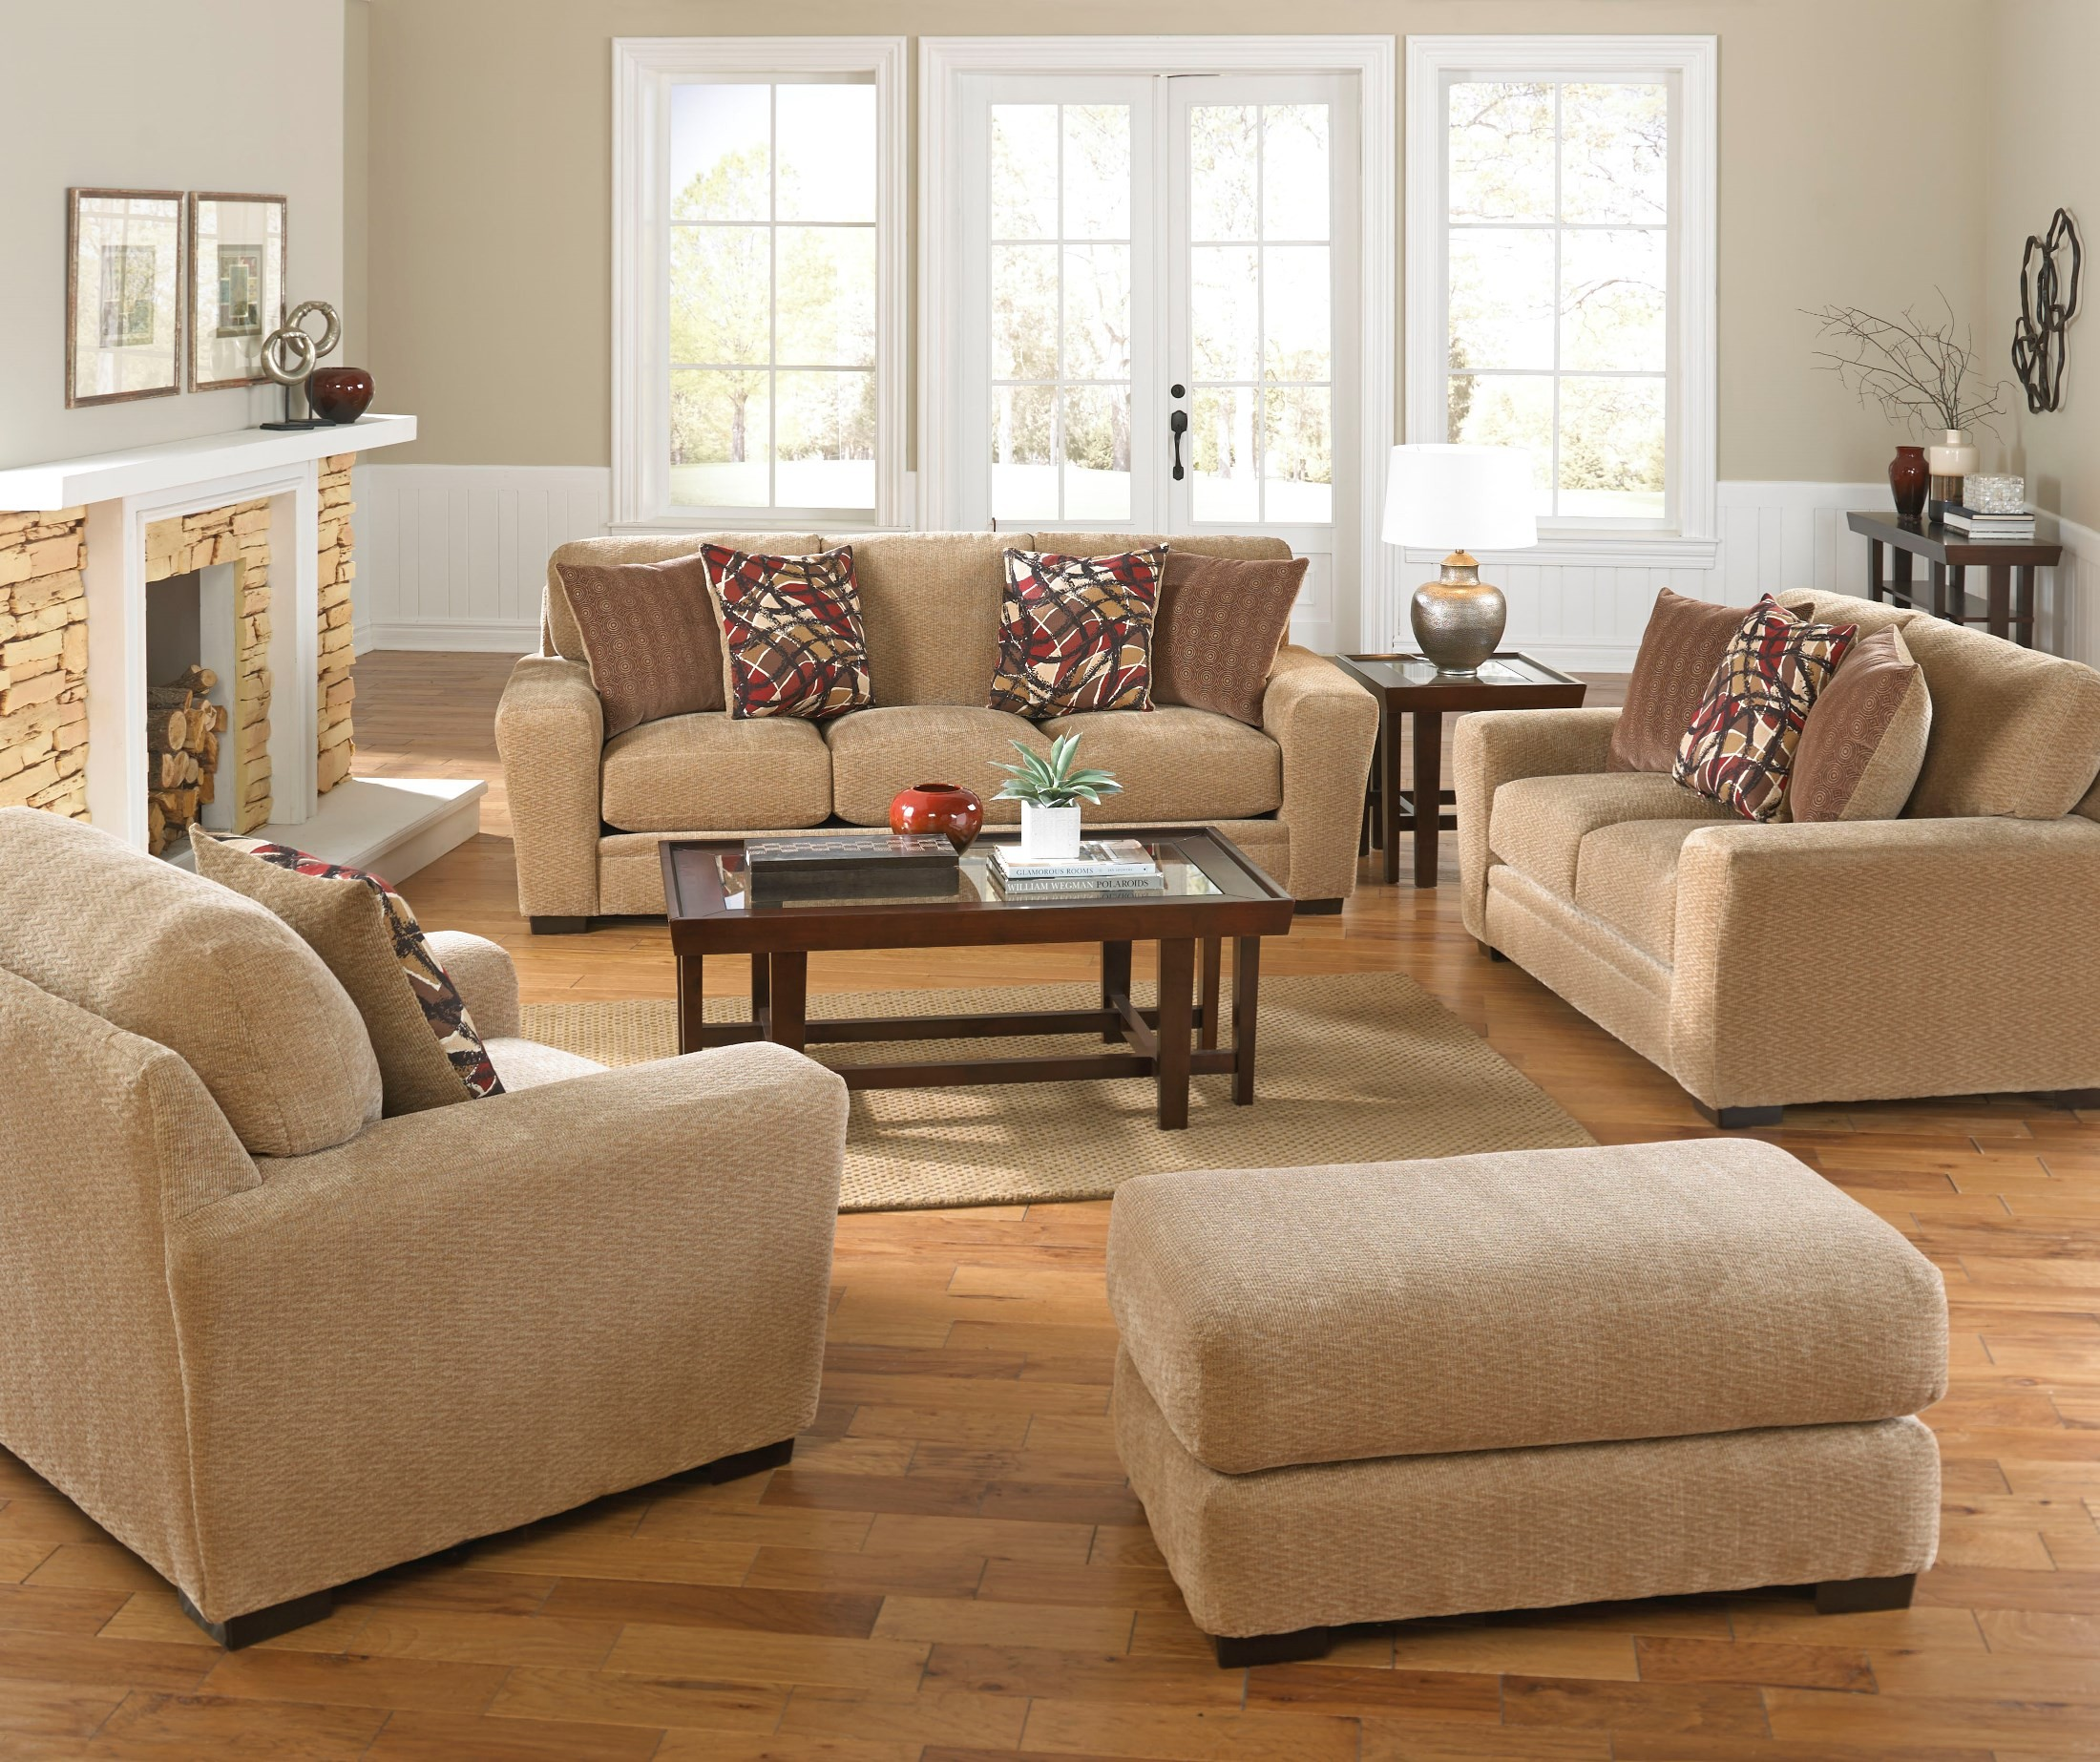 Prescott oatmeal and brick living room set 448703280136161634 jackson - The brick sofa sets ...